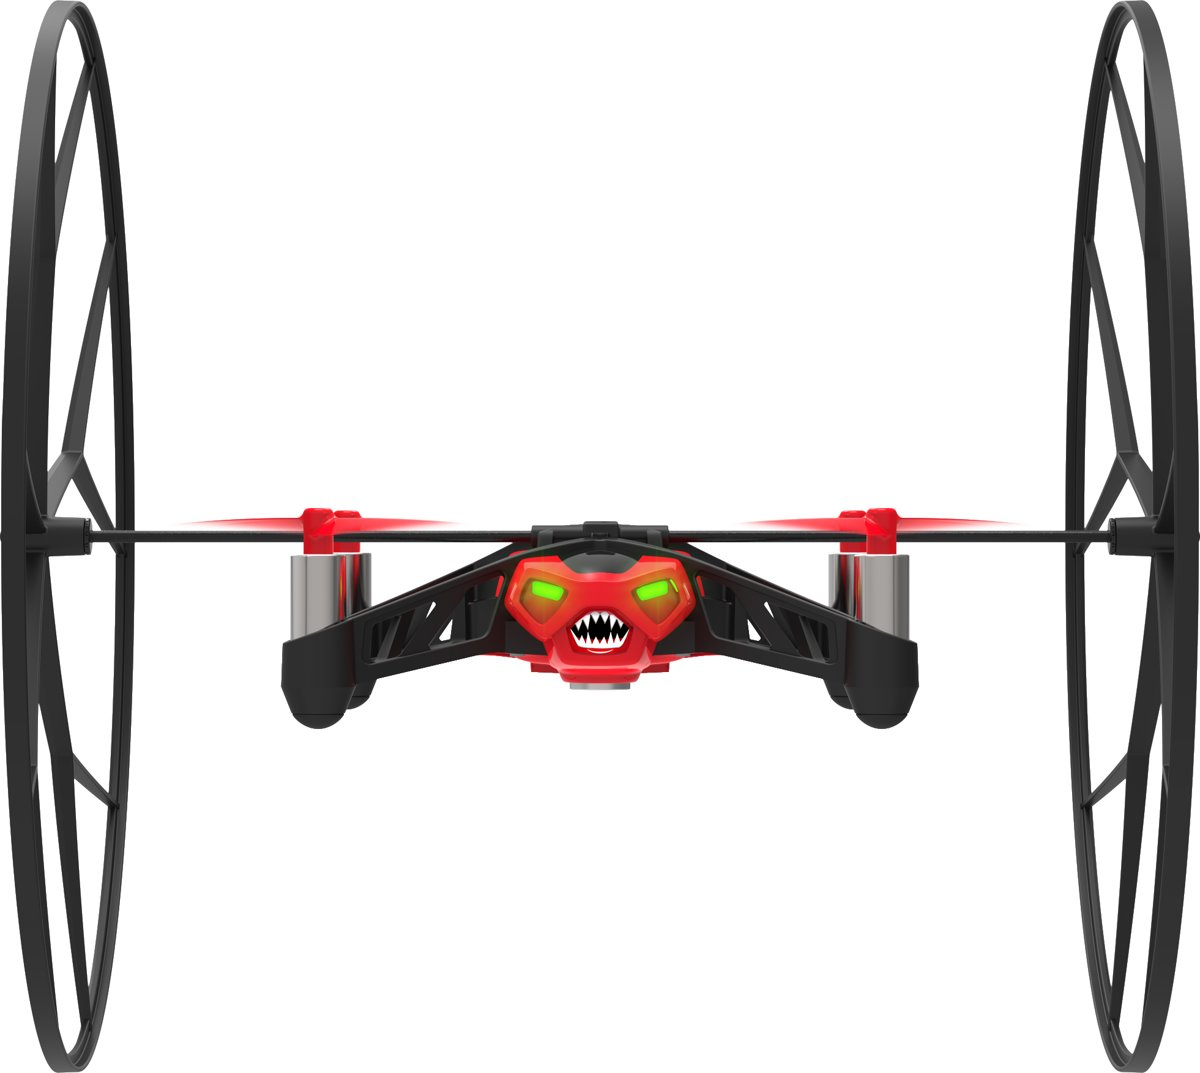 Parrot Minidrones Rolling Spider Drone Rood Hydrofoil Orak Speelgoed